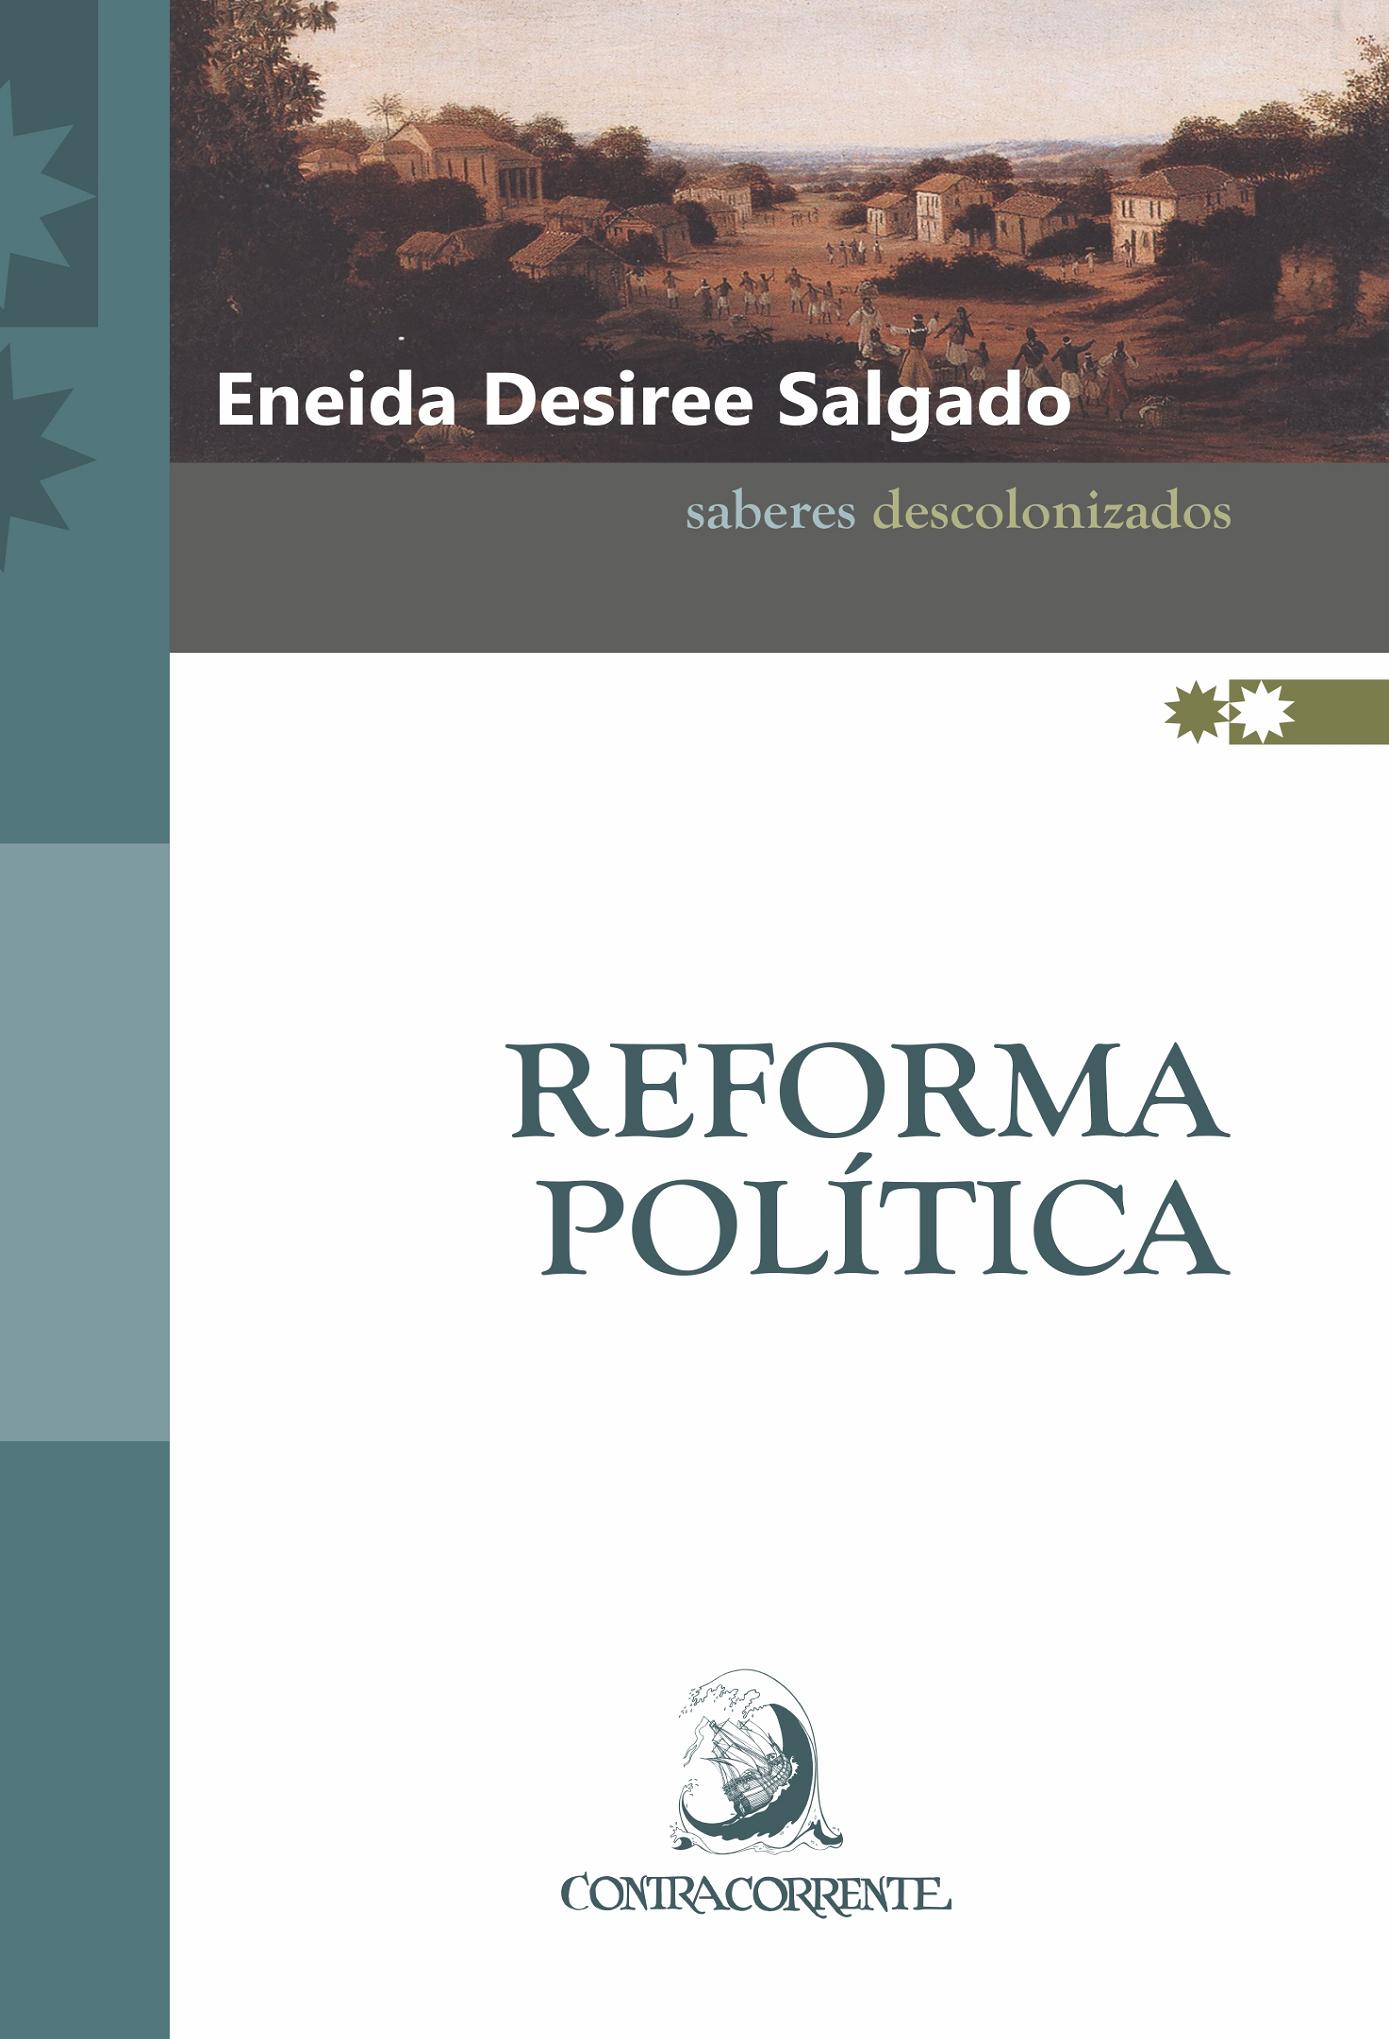 Reforma Política, livro de Eneida Desiree Salgado